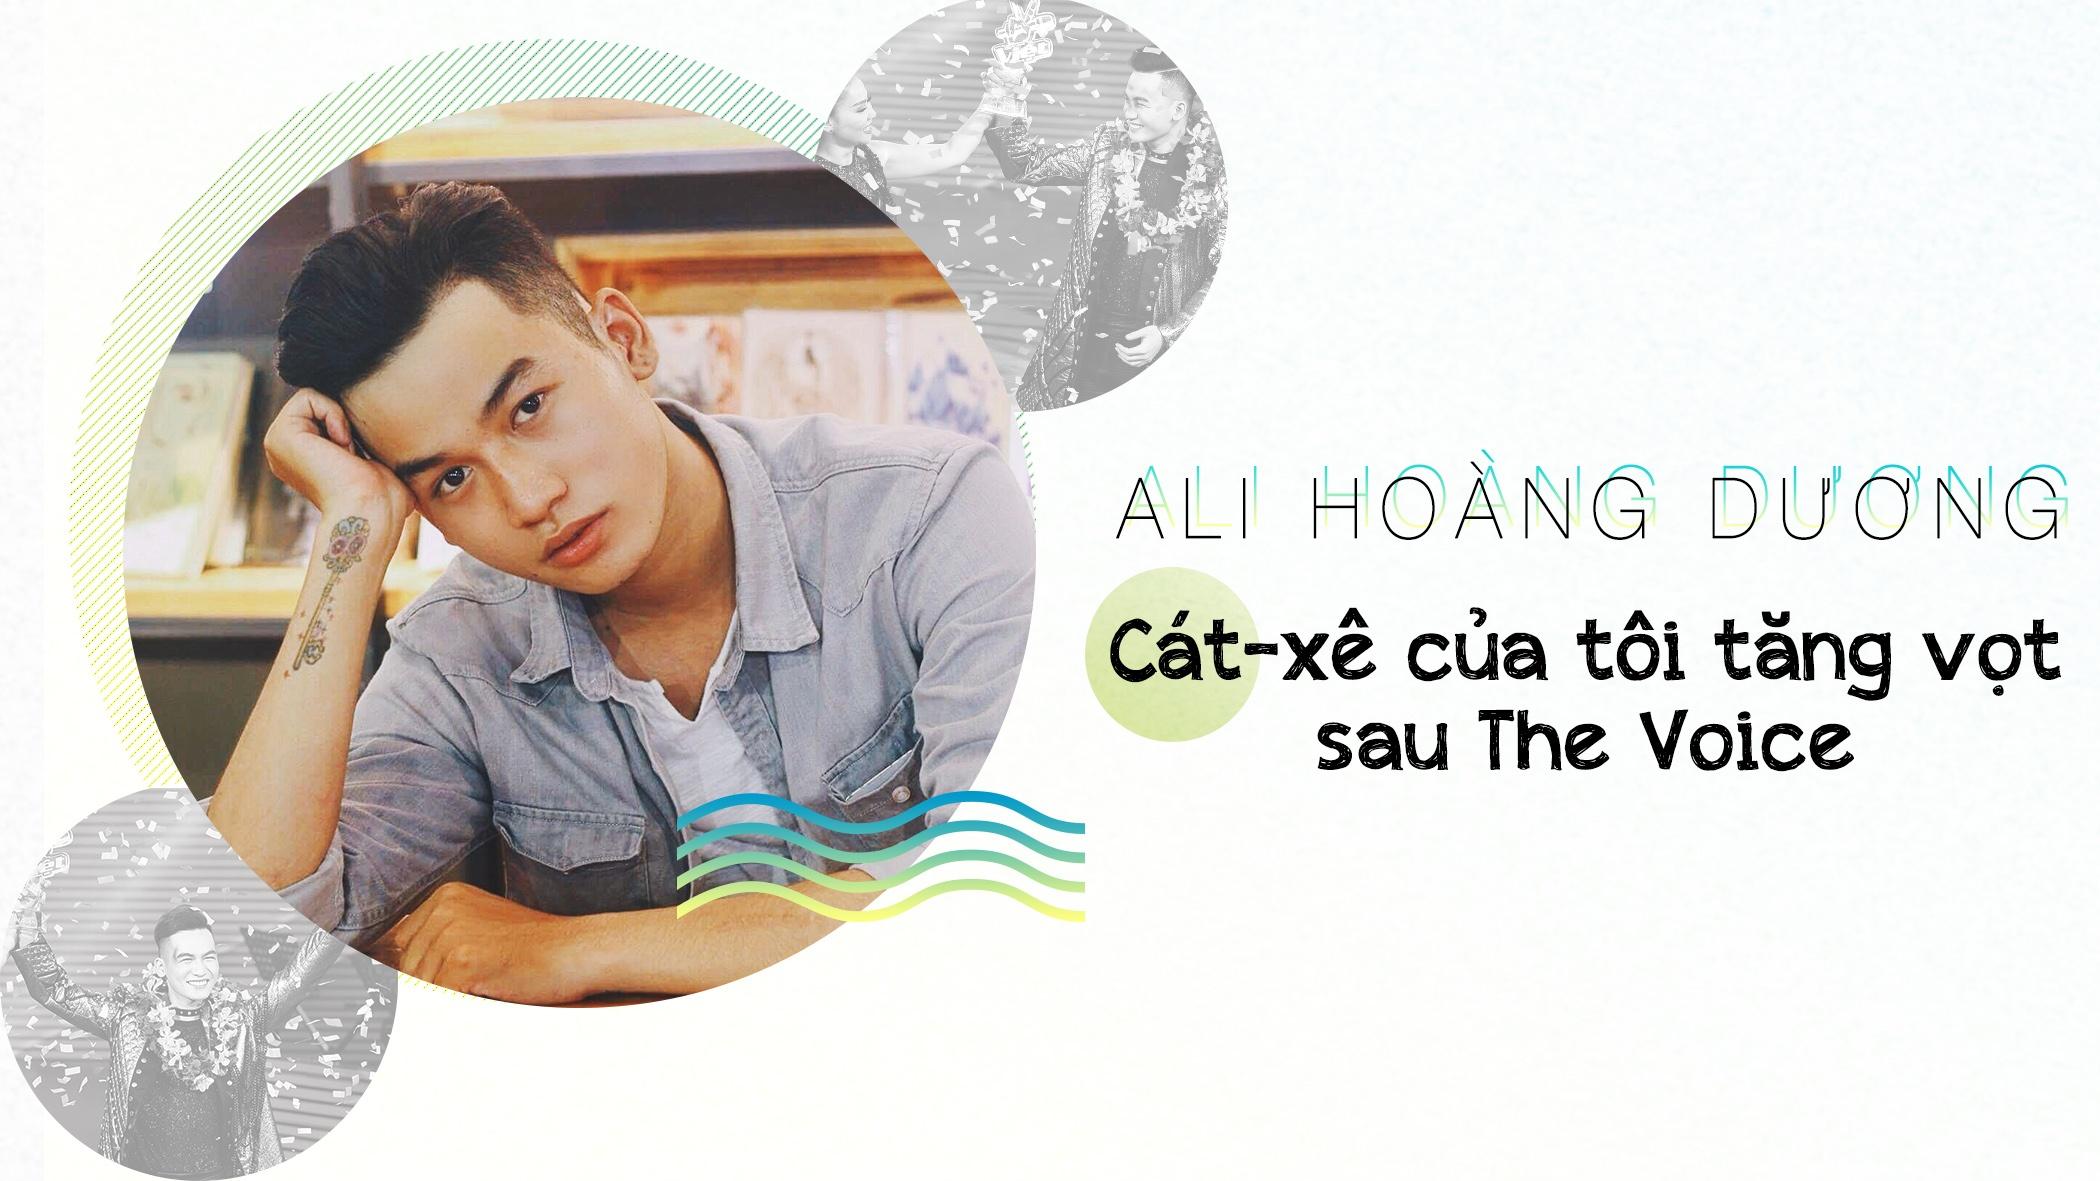 Ali Hoang Duong: 'Cat-xe cua toi tang vot sau The Voice' hinh anh 1